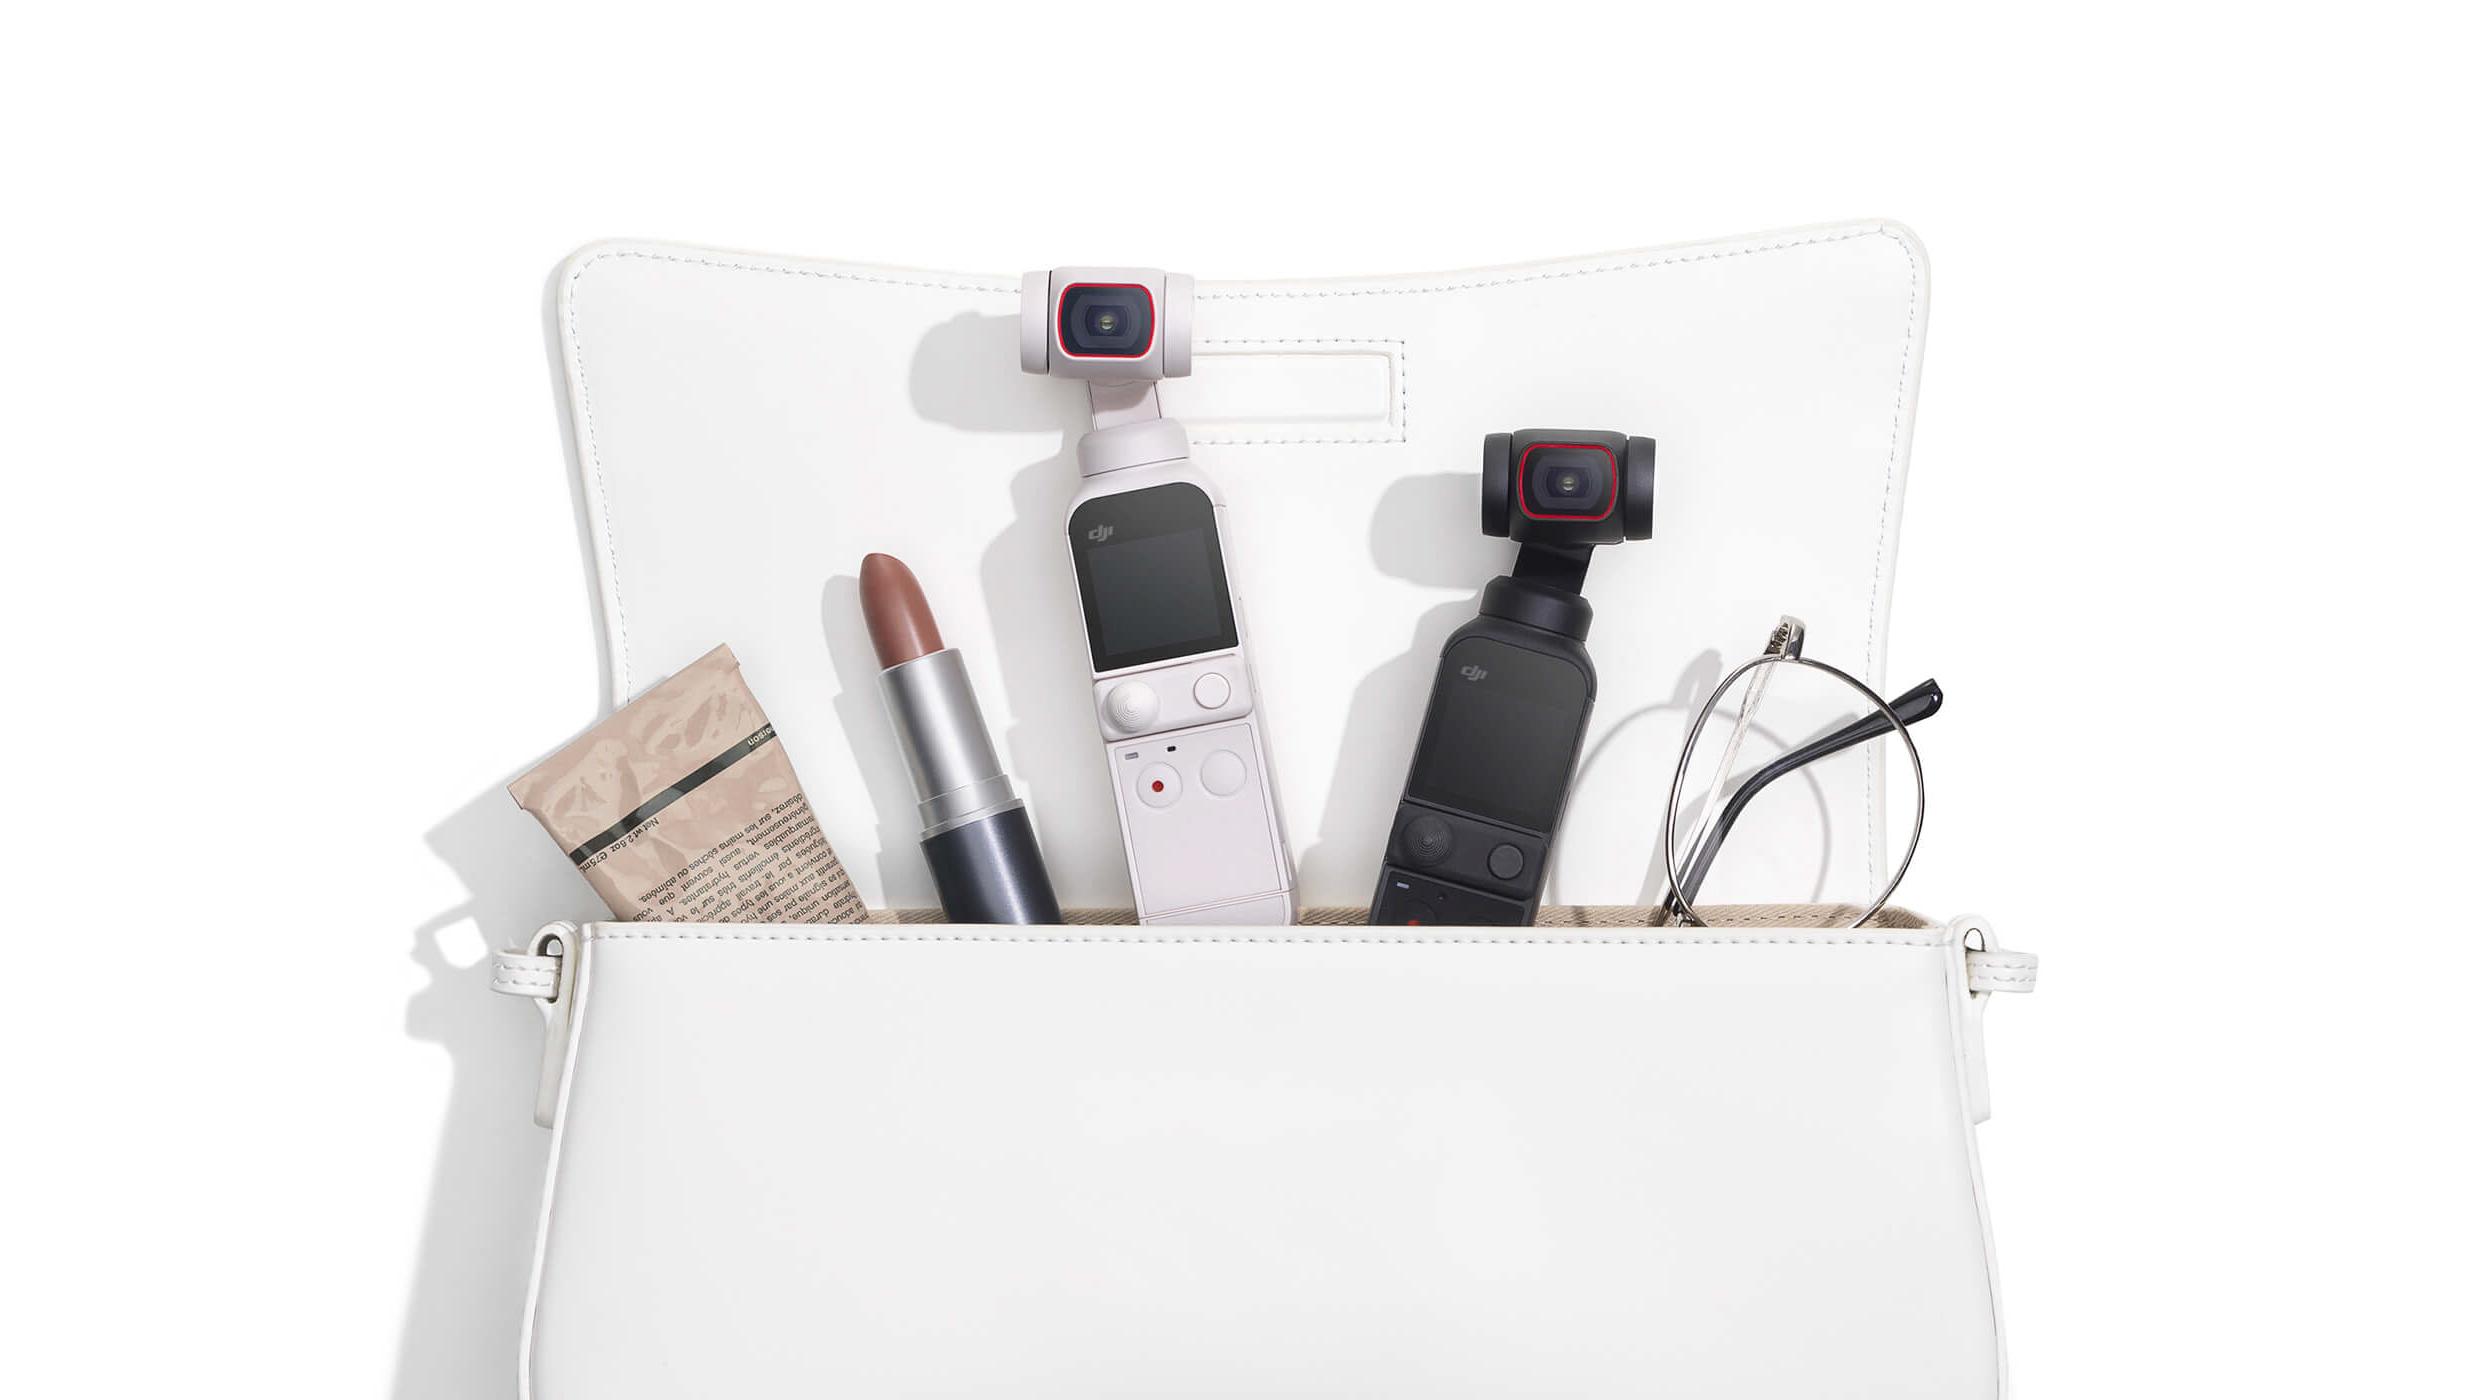 DJI Pocket 2 portable and small